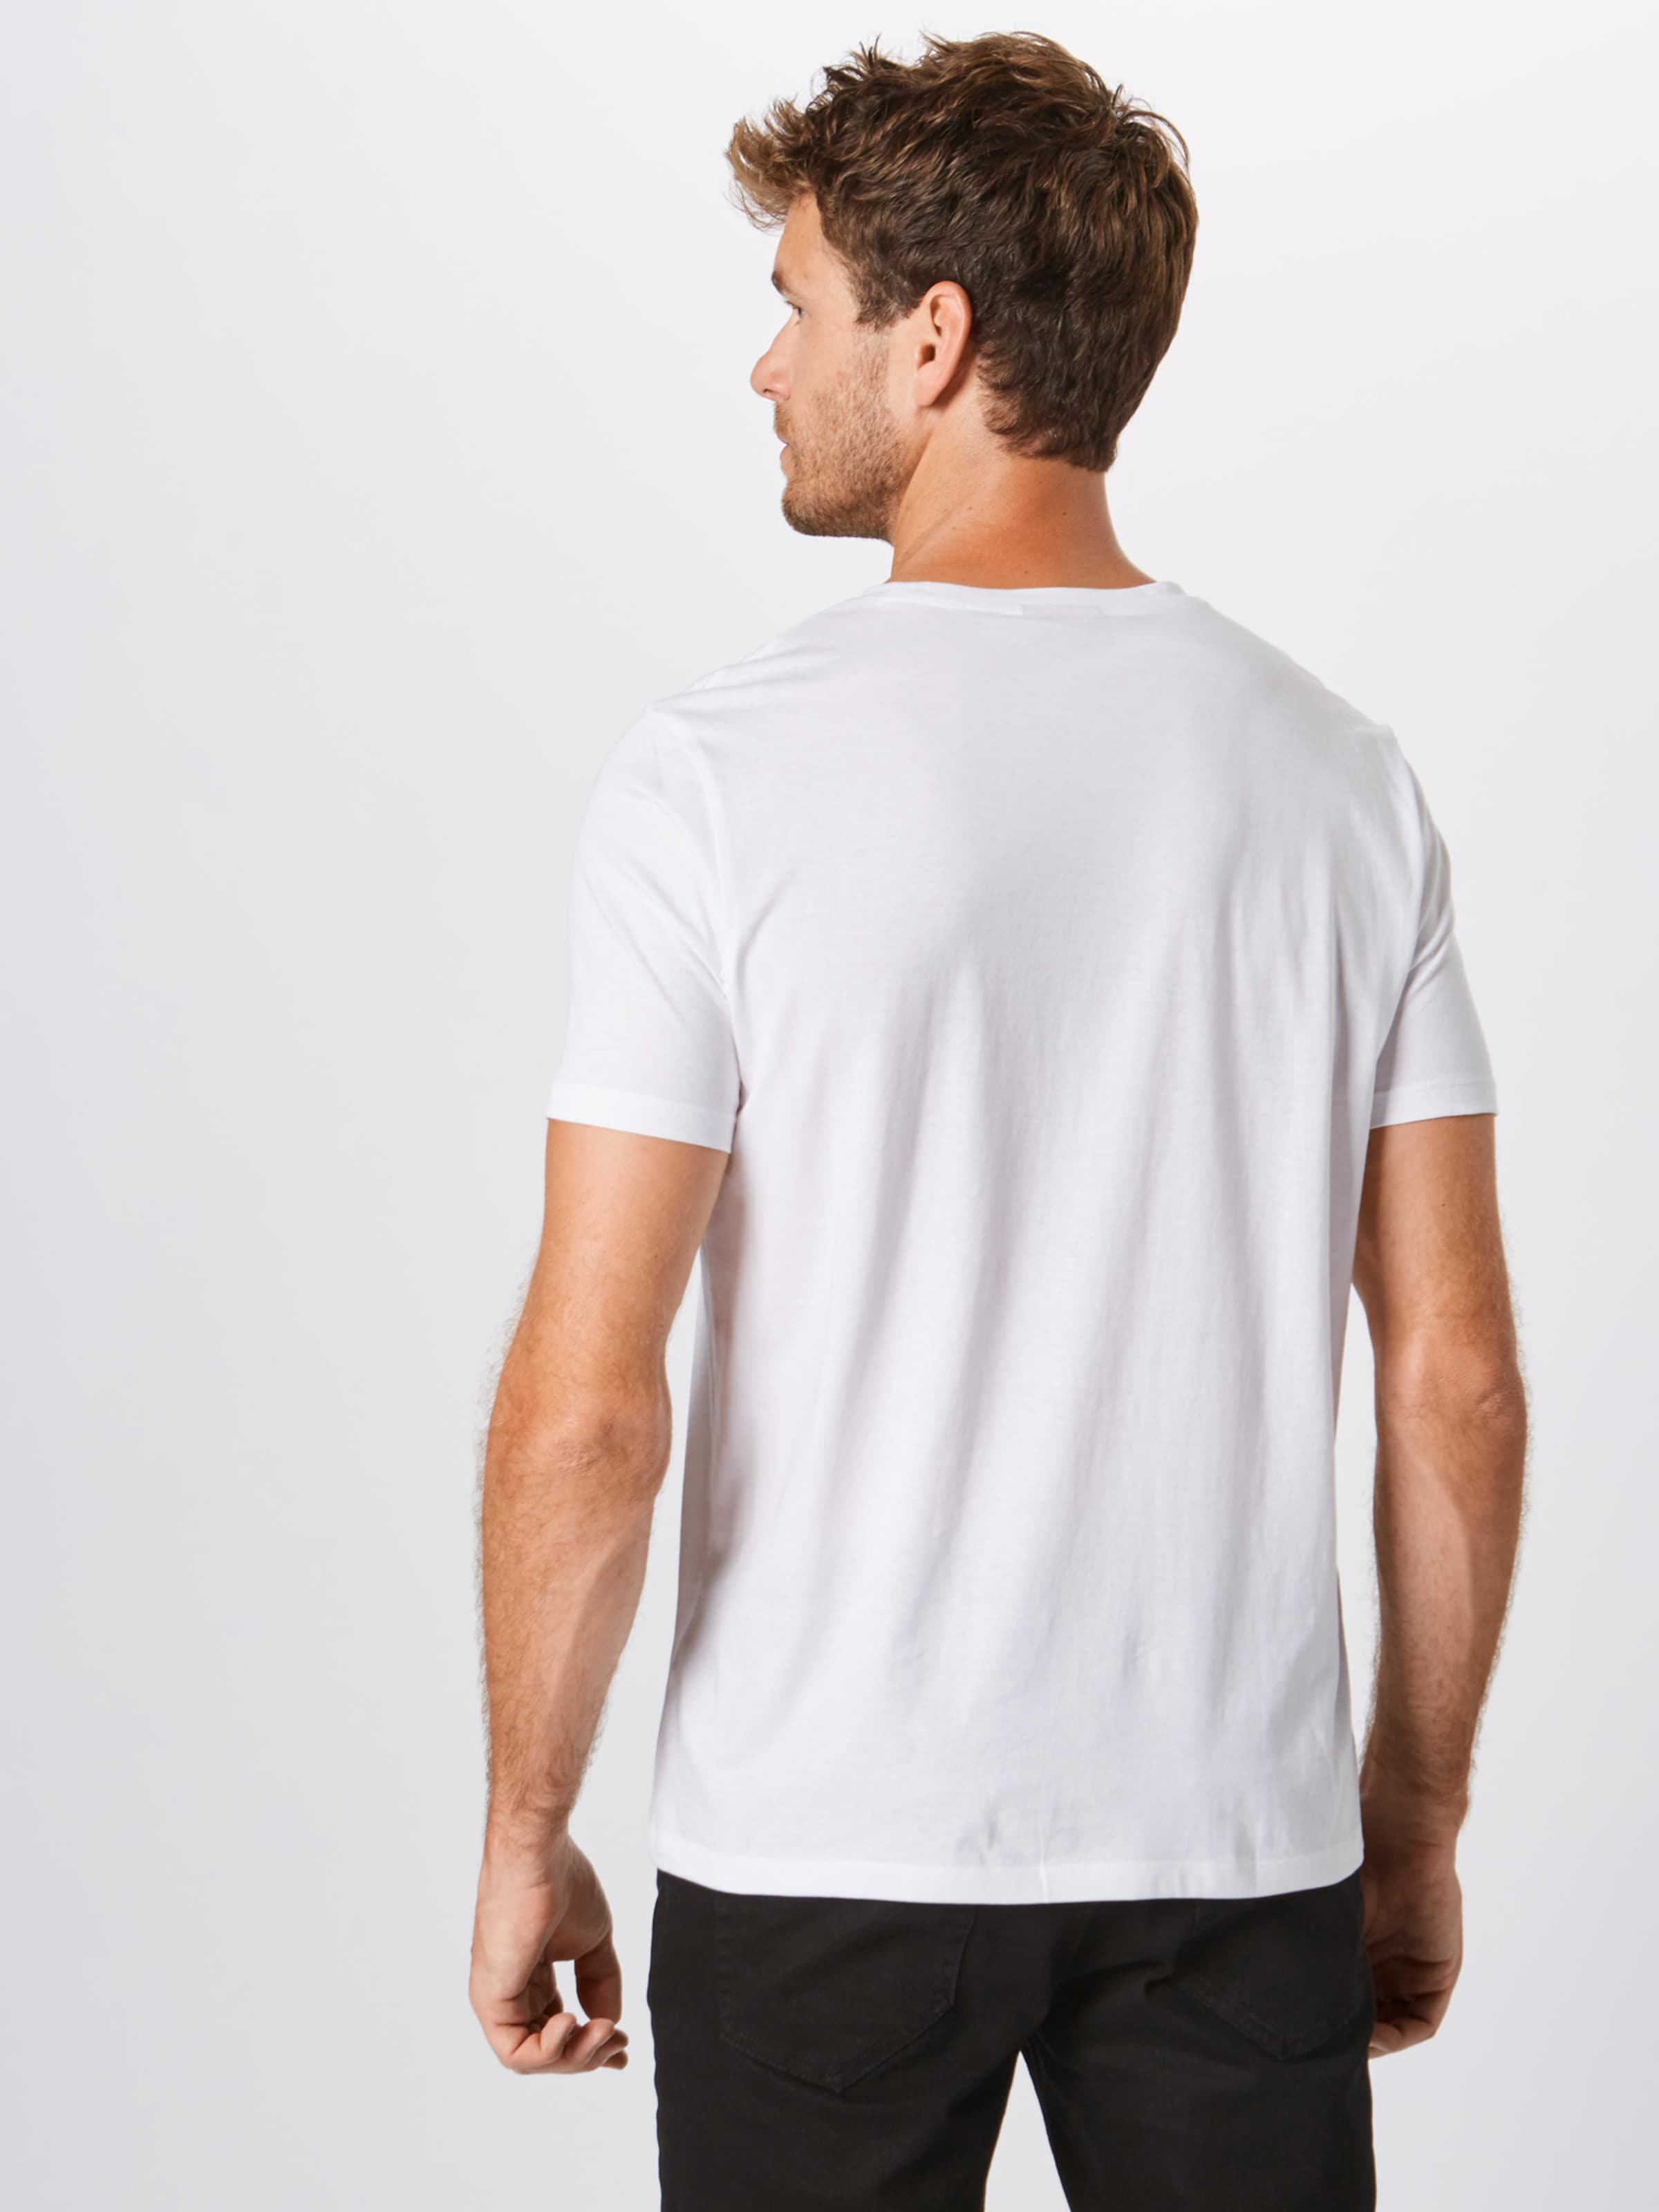 In Hugo Weiß In Shirt Shirt Hugo 'dolive194' 'dolive194' Shirt Hugo 'dolive194' Weiß In xEQWCBerdo